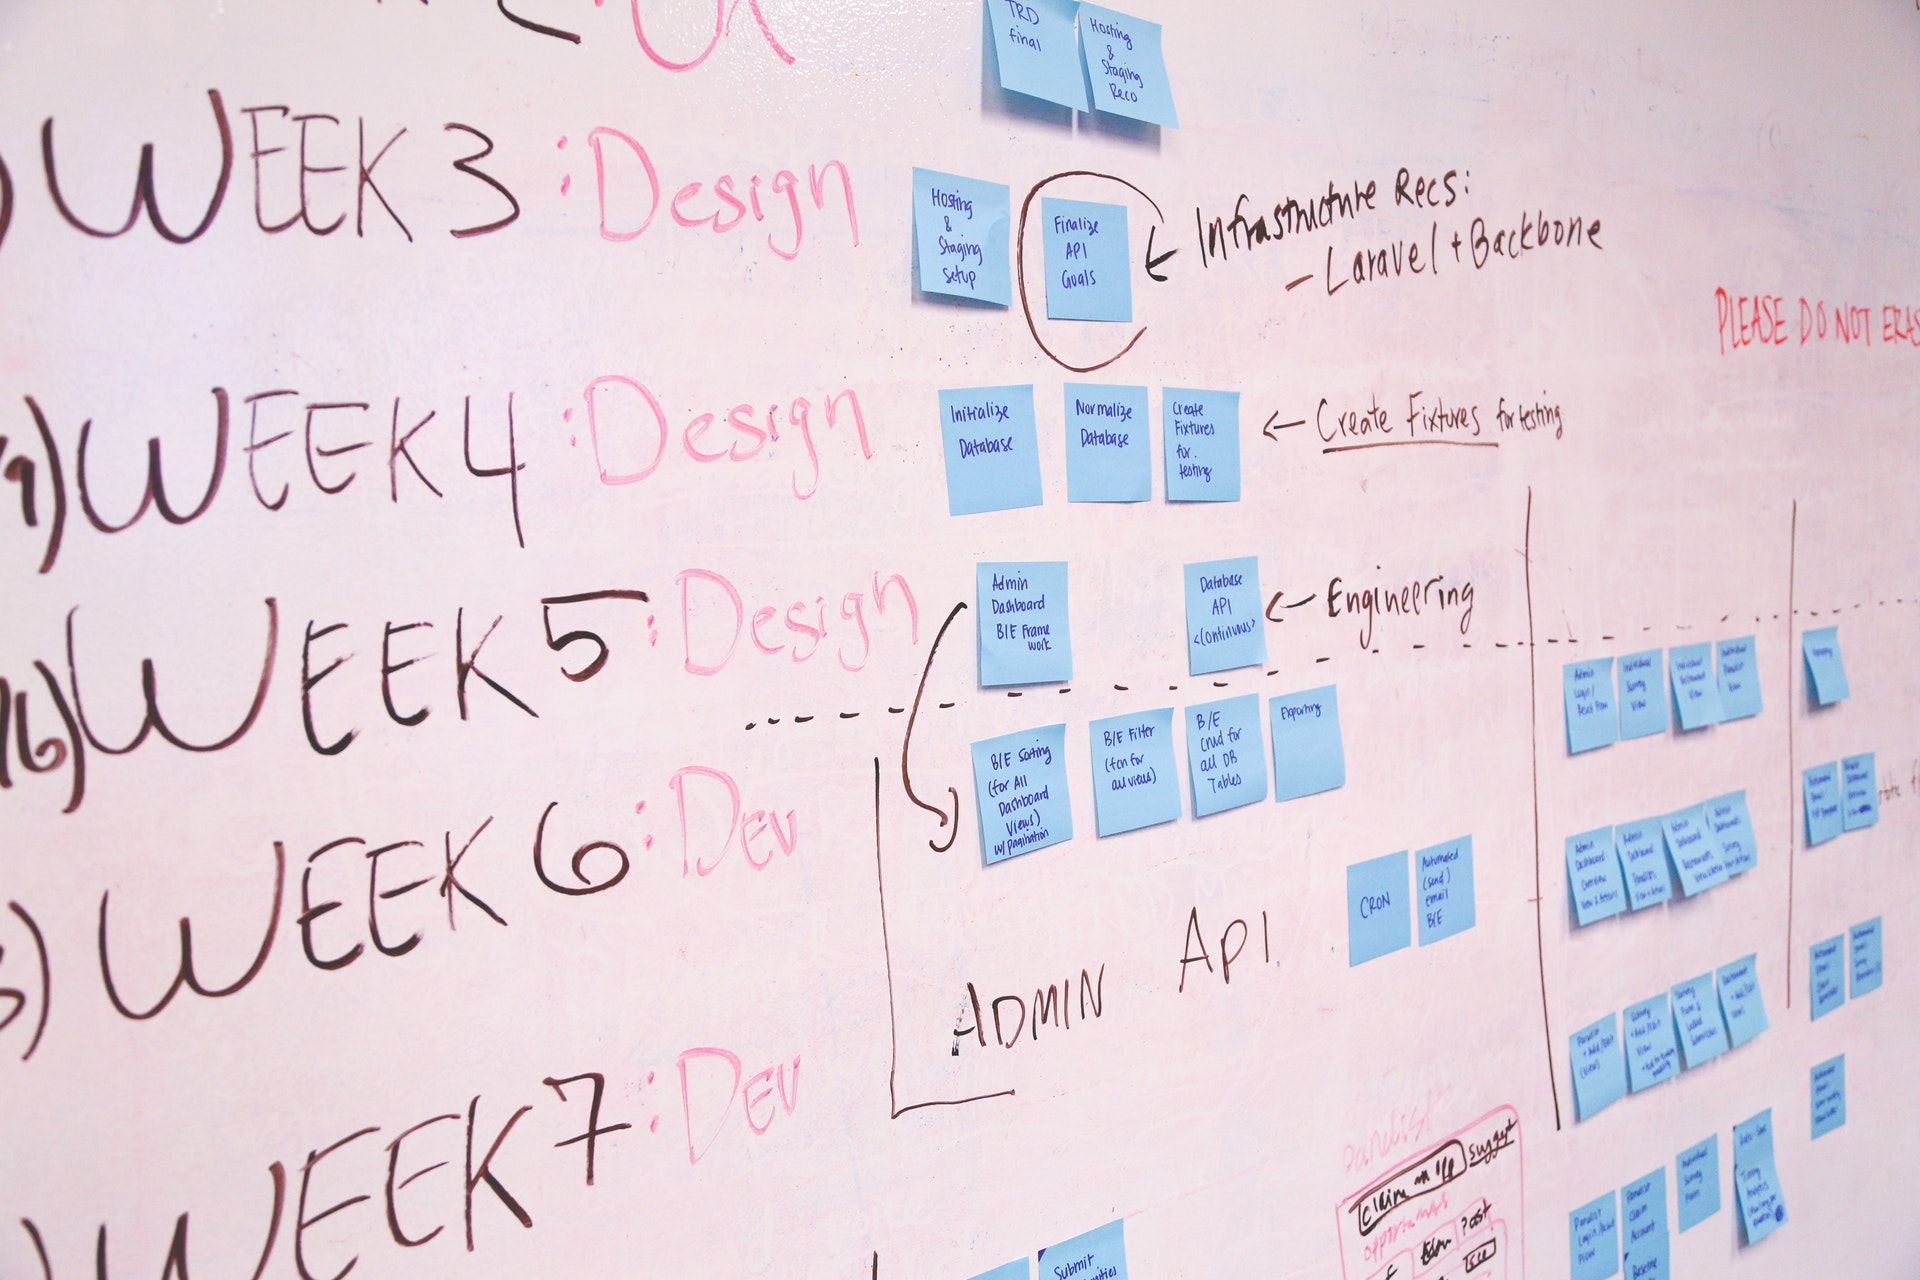 5 Project Management Keys for a Successful Website Development Project